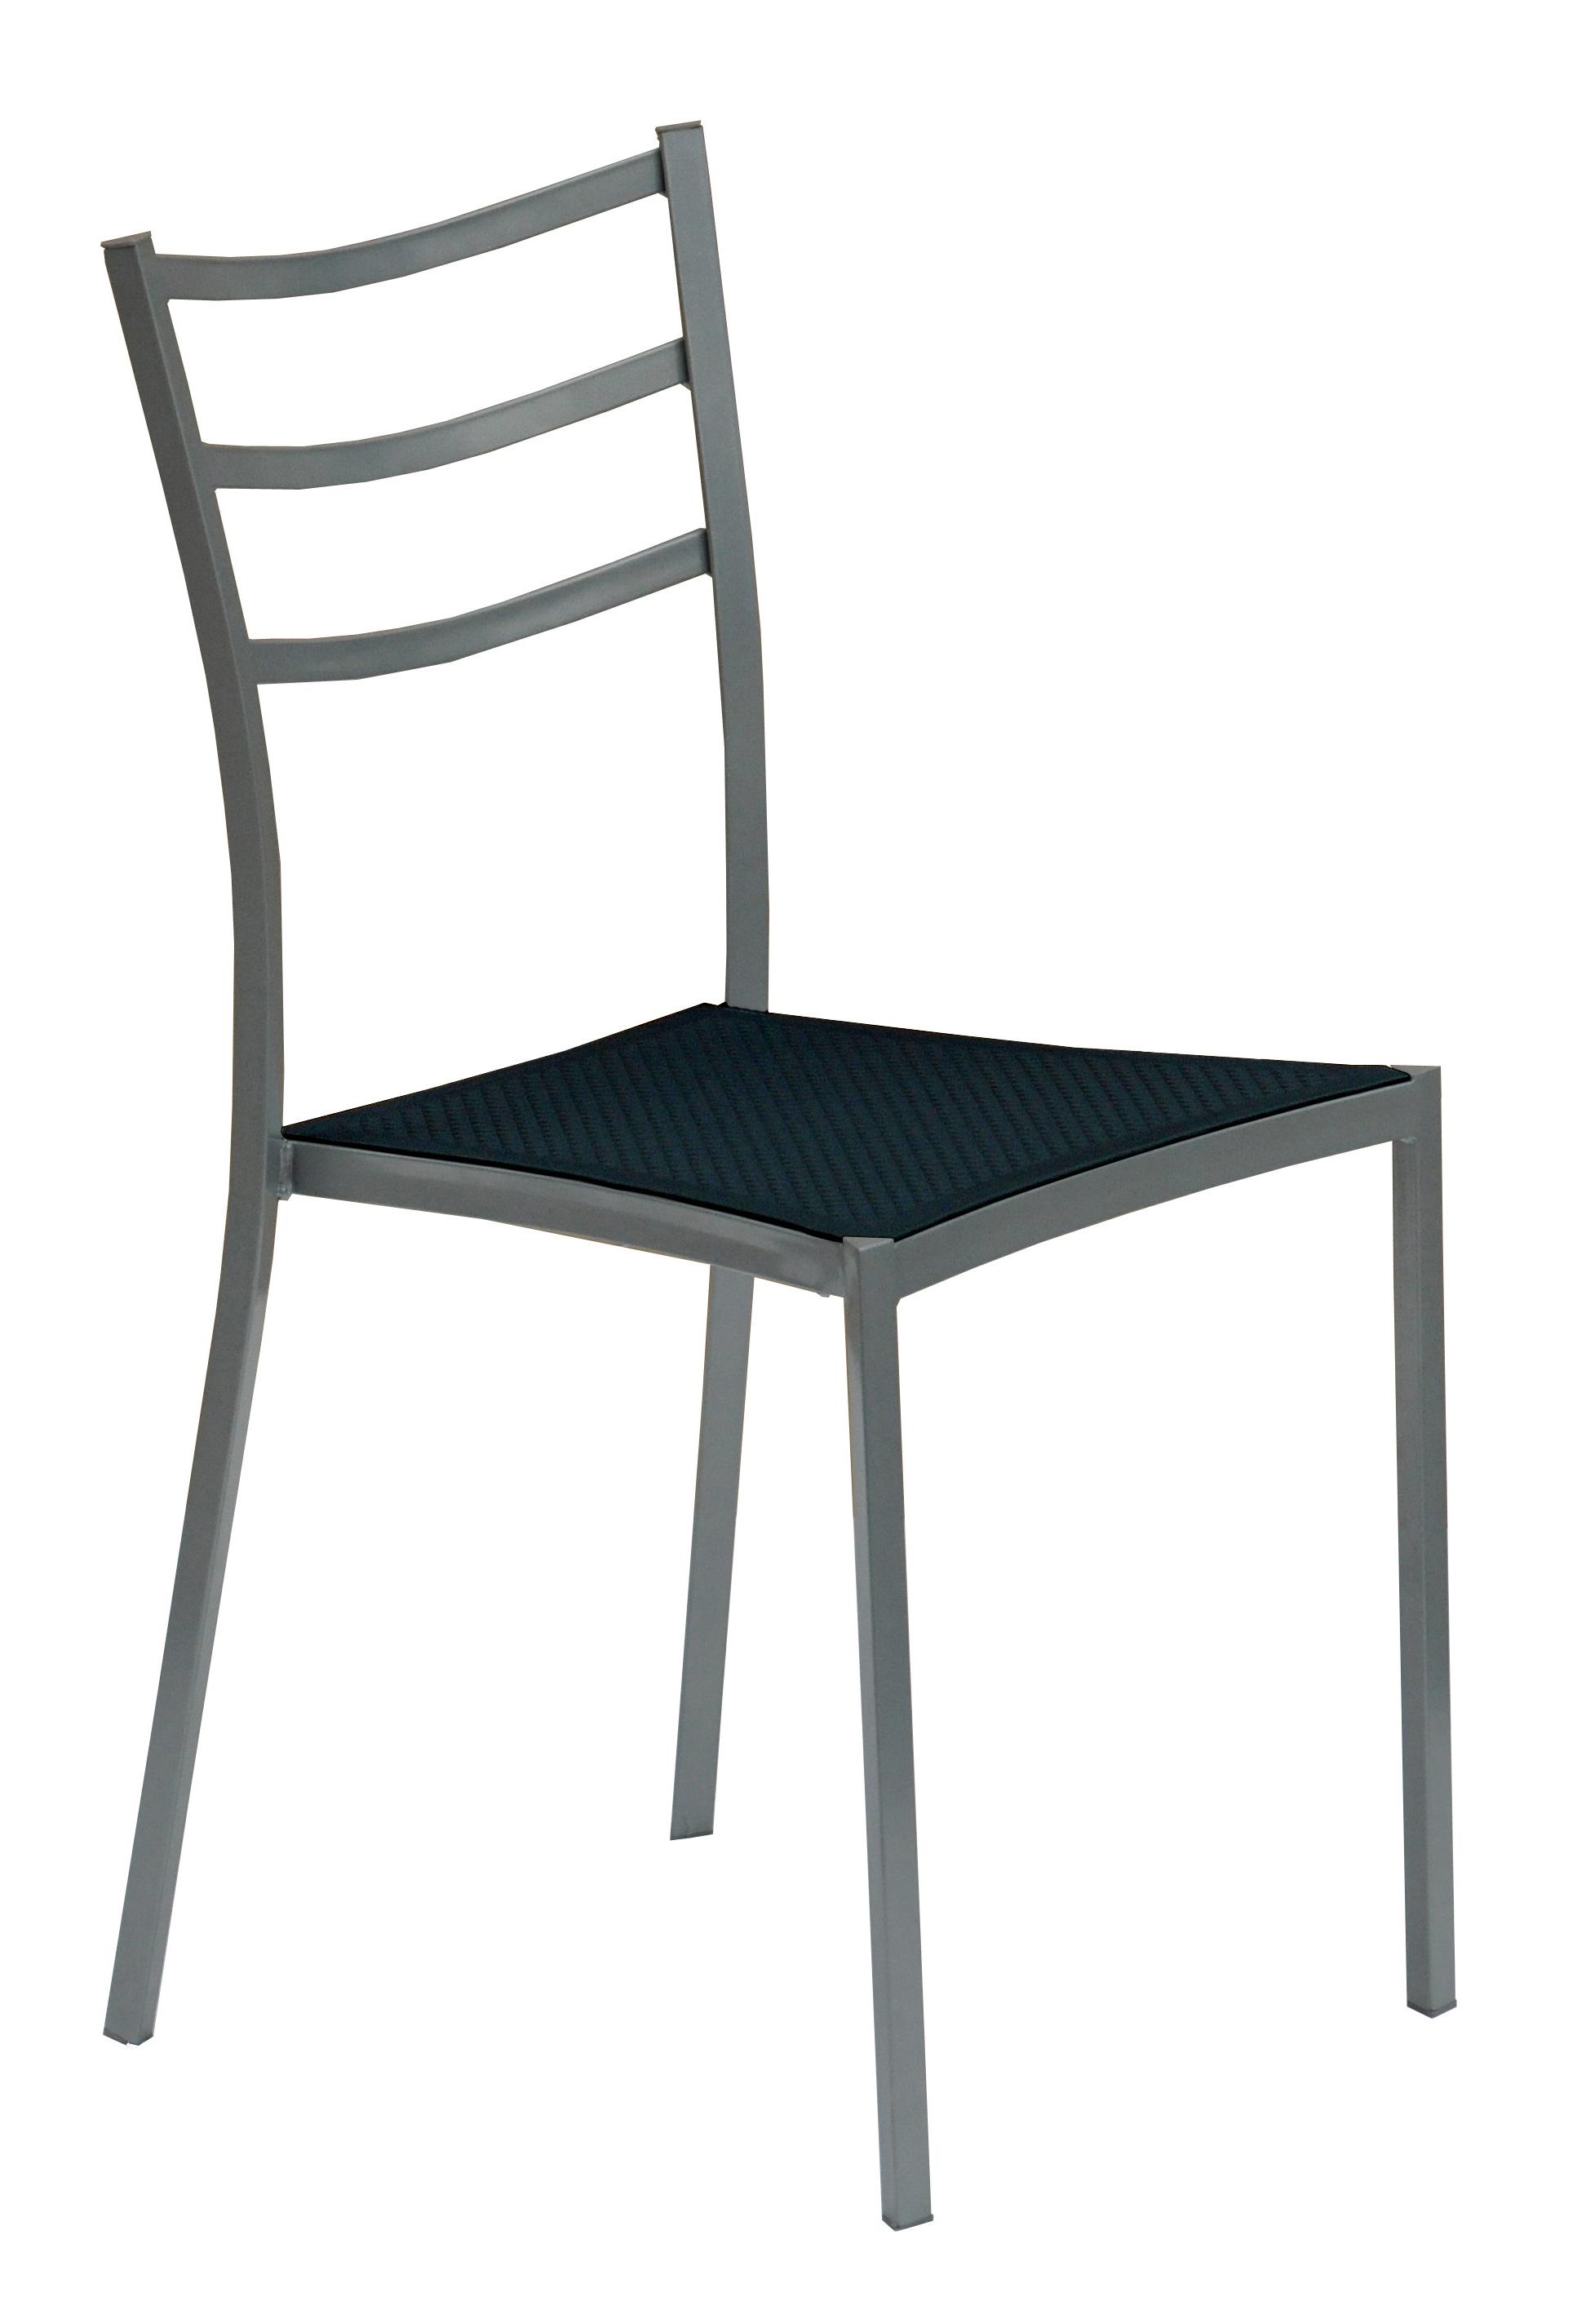 Jedálenská stolička - Halmar - K 159 šedá + čierna